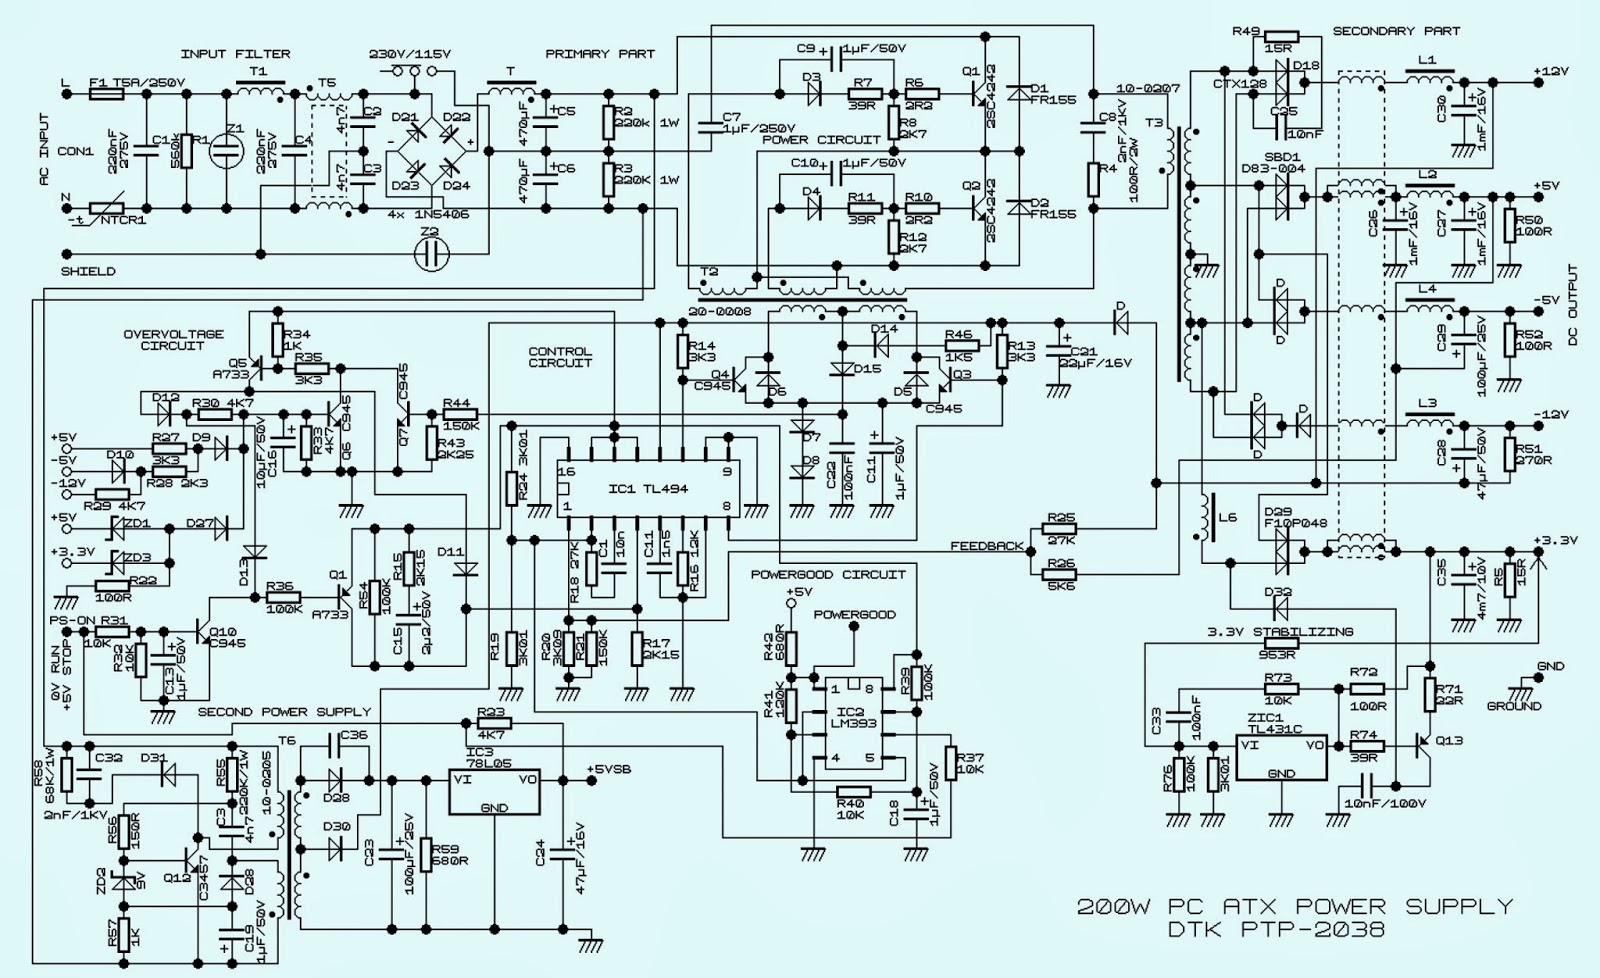 200W ATX POWER SUPPLY  COMPUTER  SCHEMATIC (Circuit